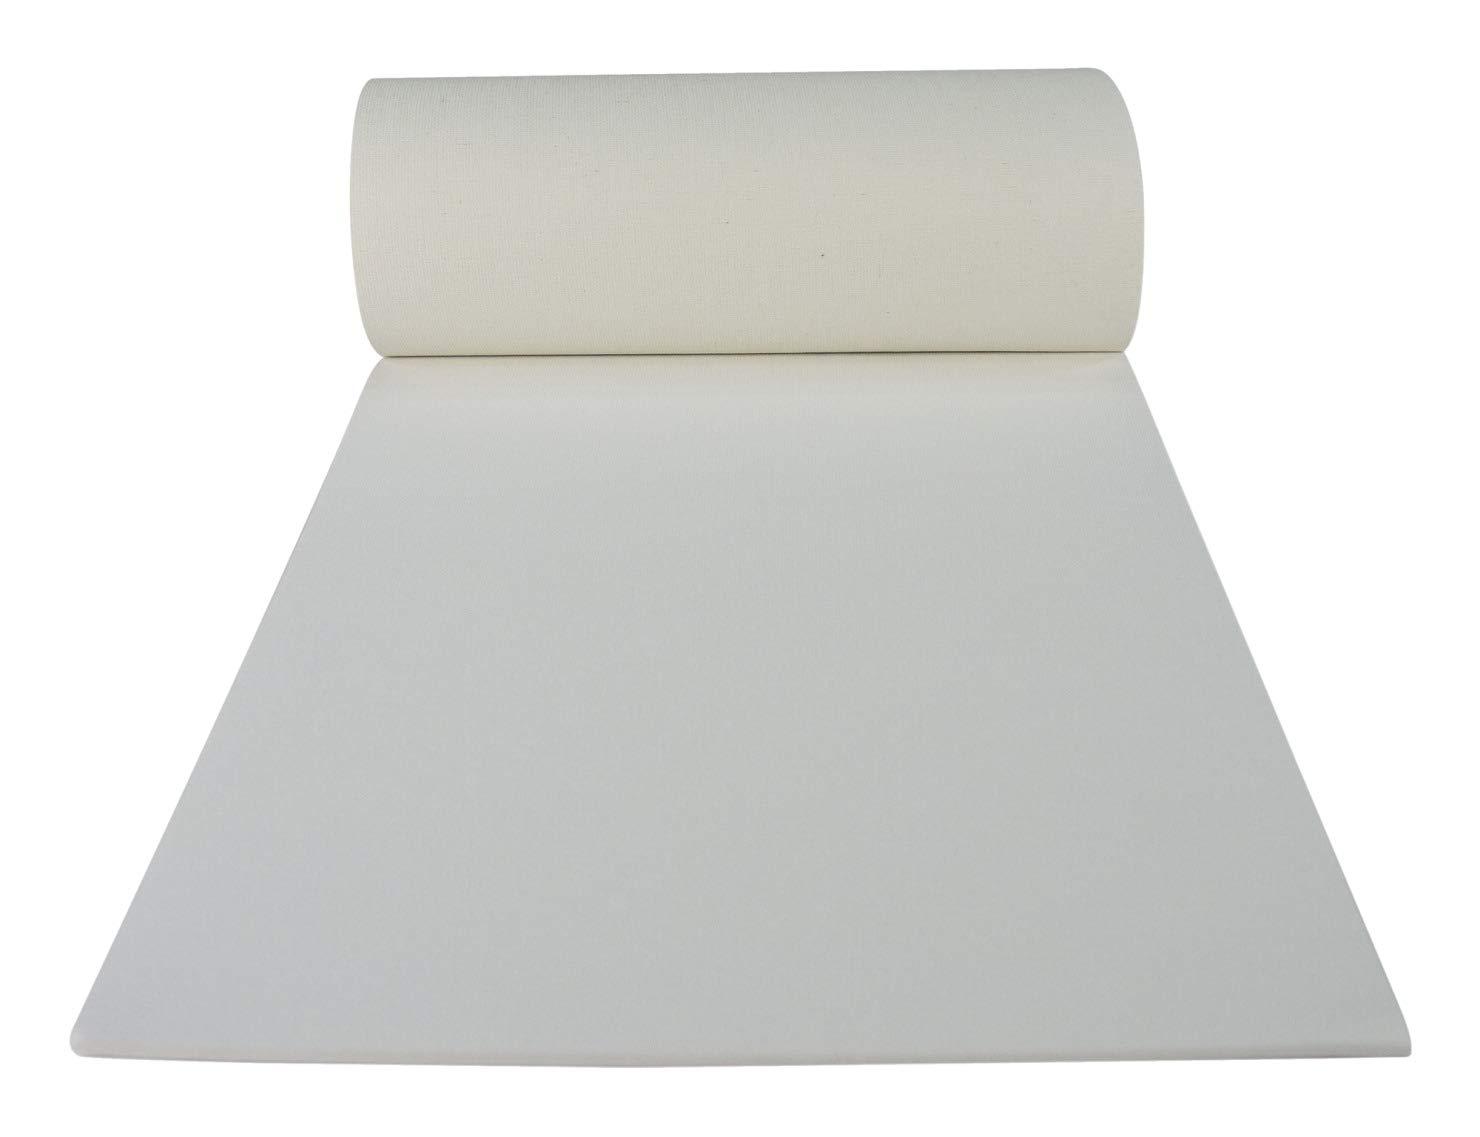 16 x 20 inches 10 Sheets per Pad White Sax Genuine Canvas Pad